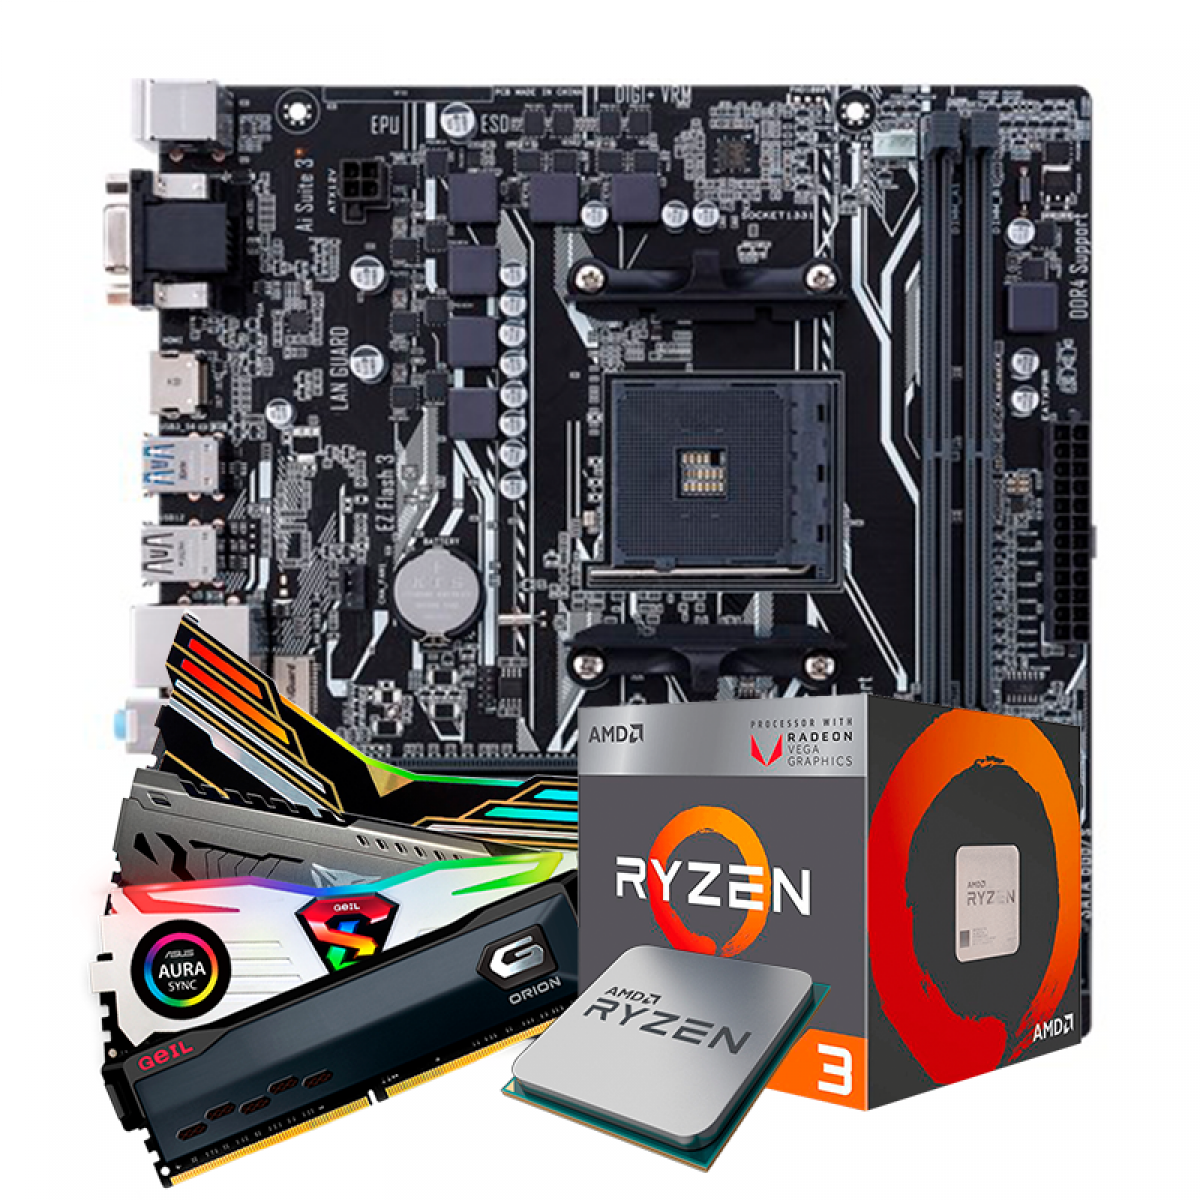 Kit Upgrade, AMD Ryzen 3 2200G, ASUS Prime A320M-K, Memória DDR4 16GB (2x8GB) 3000MHz